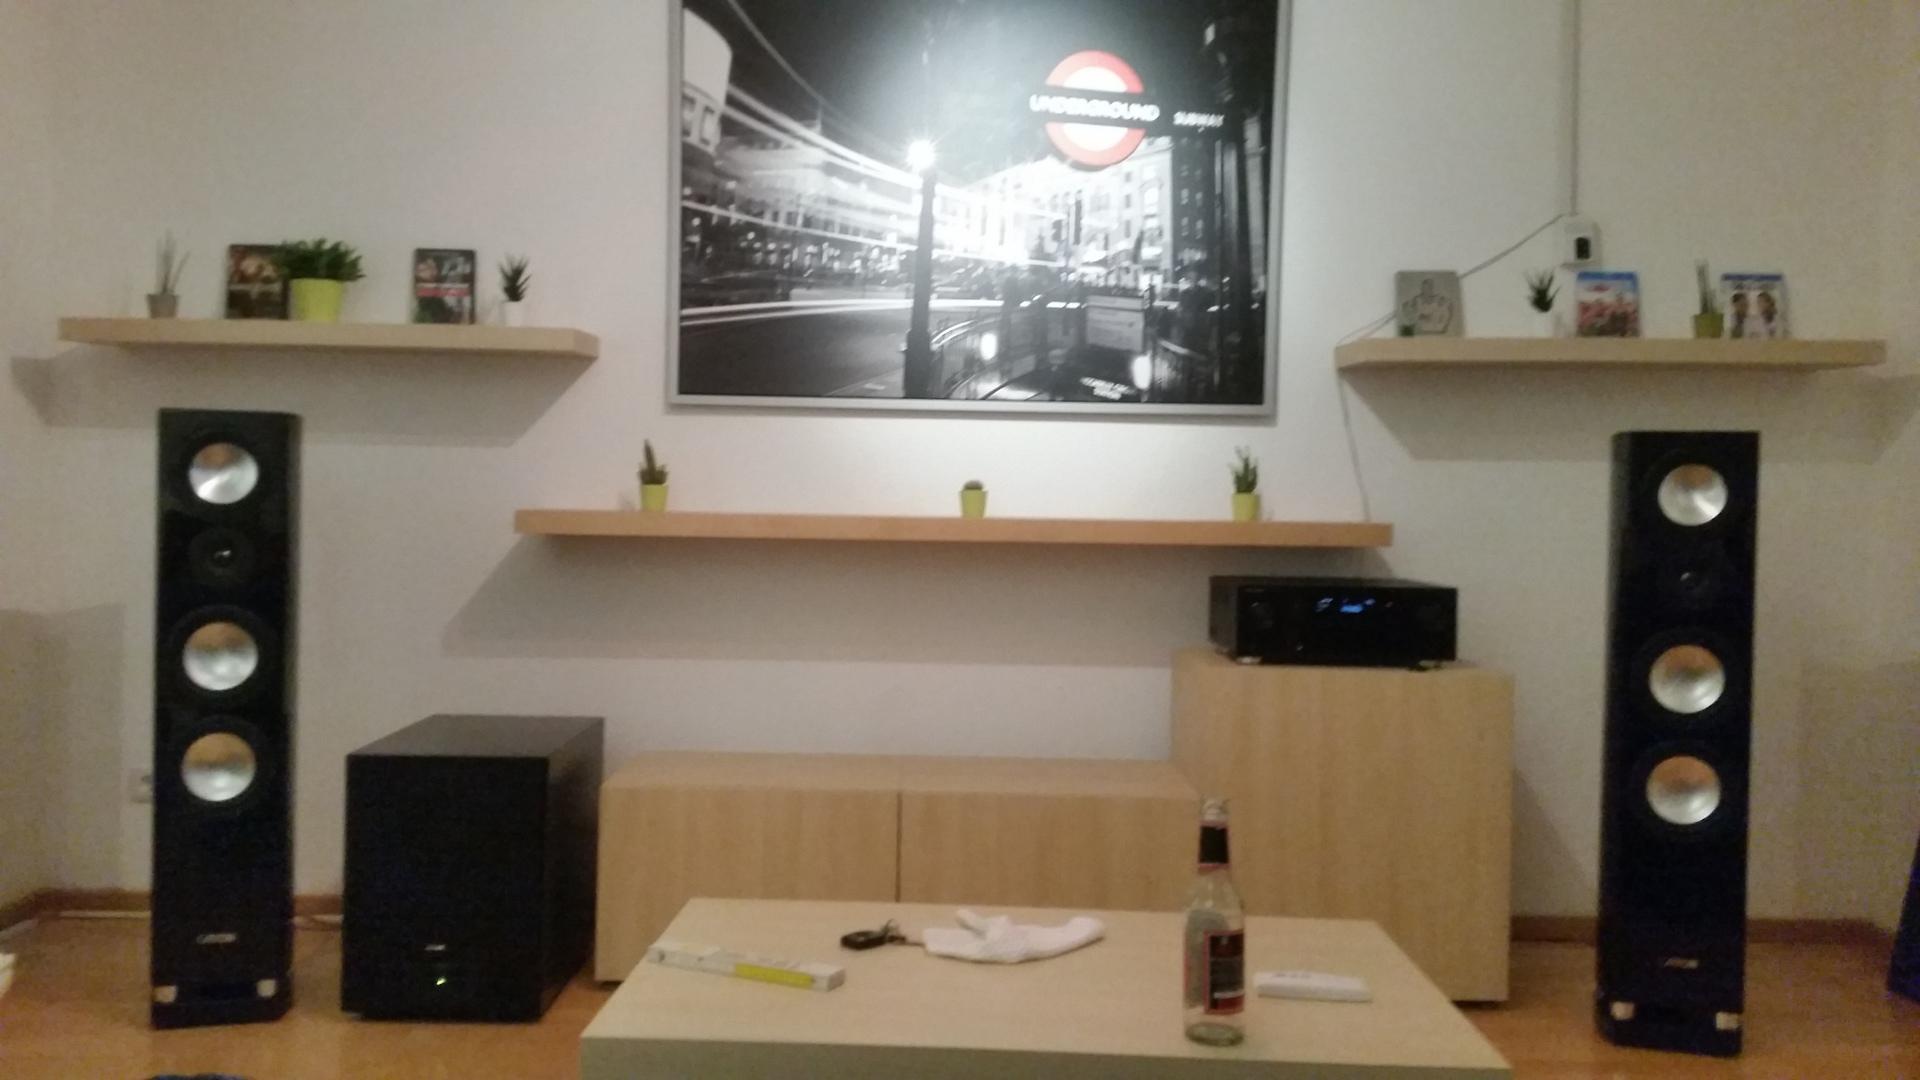 Mein 2.1 Setup mit Kino-Funktion | beamer, cantonventoreference5dc ...